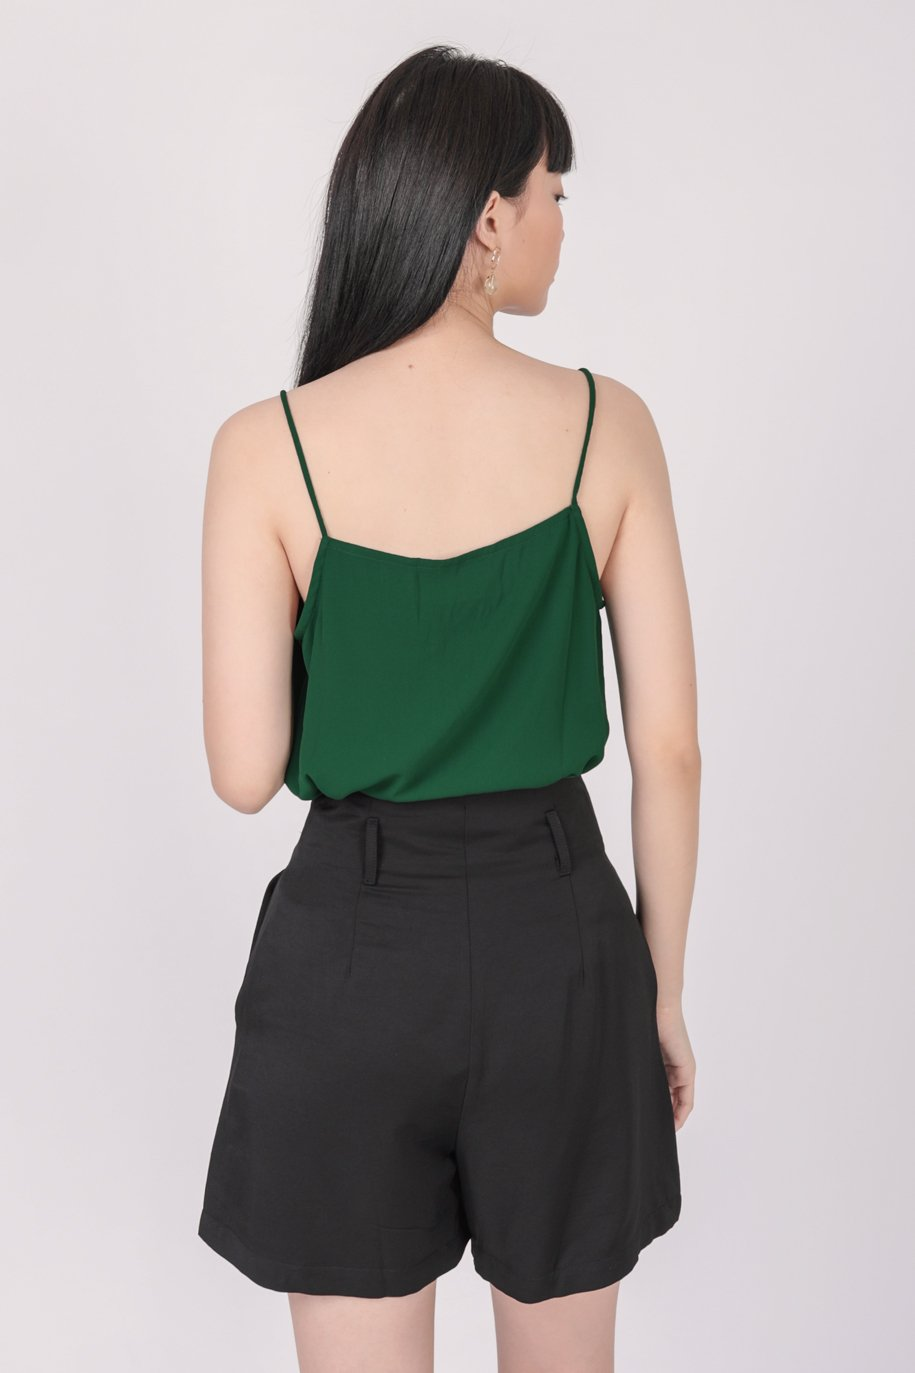 Jannah Spag Top (Emerald)